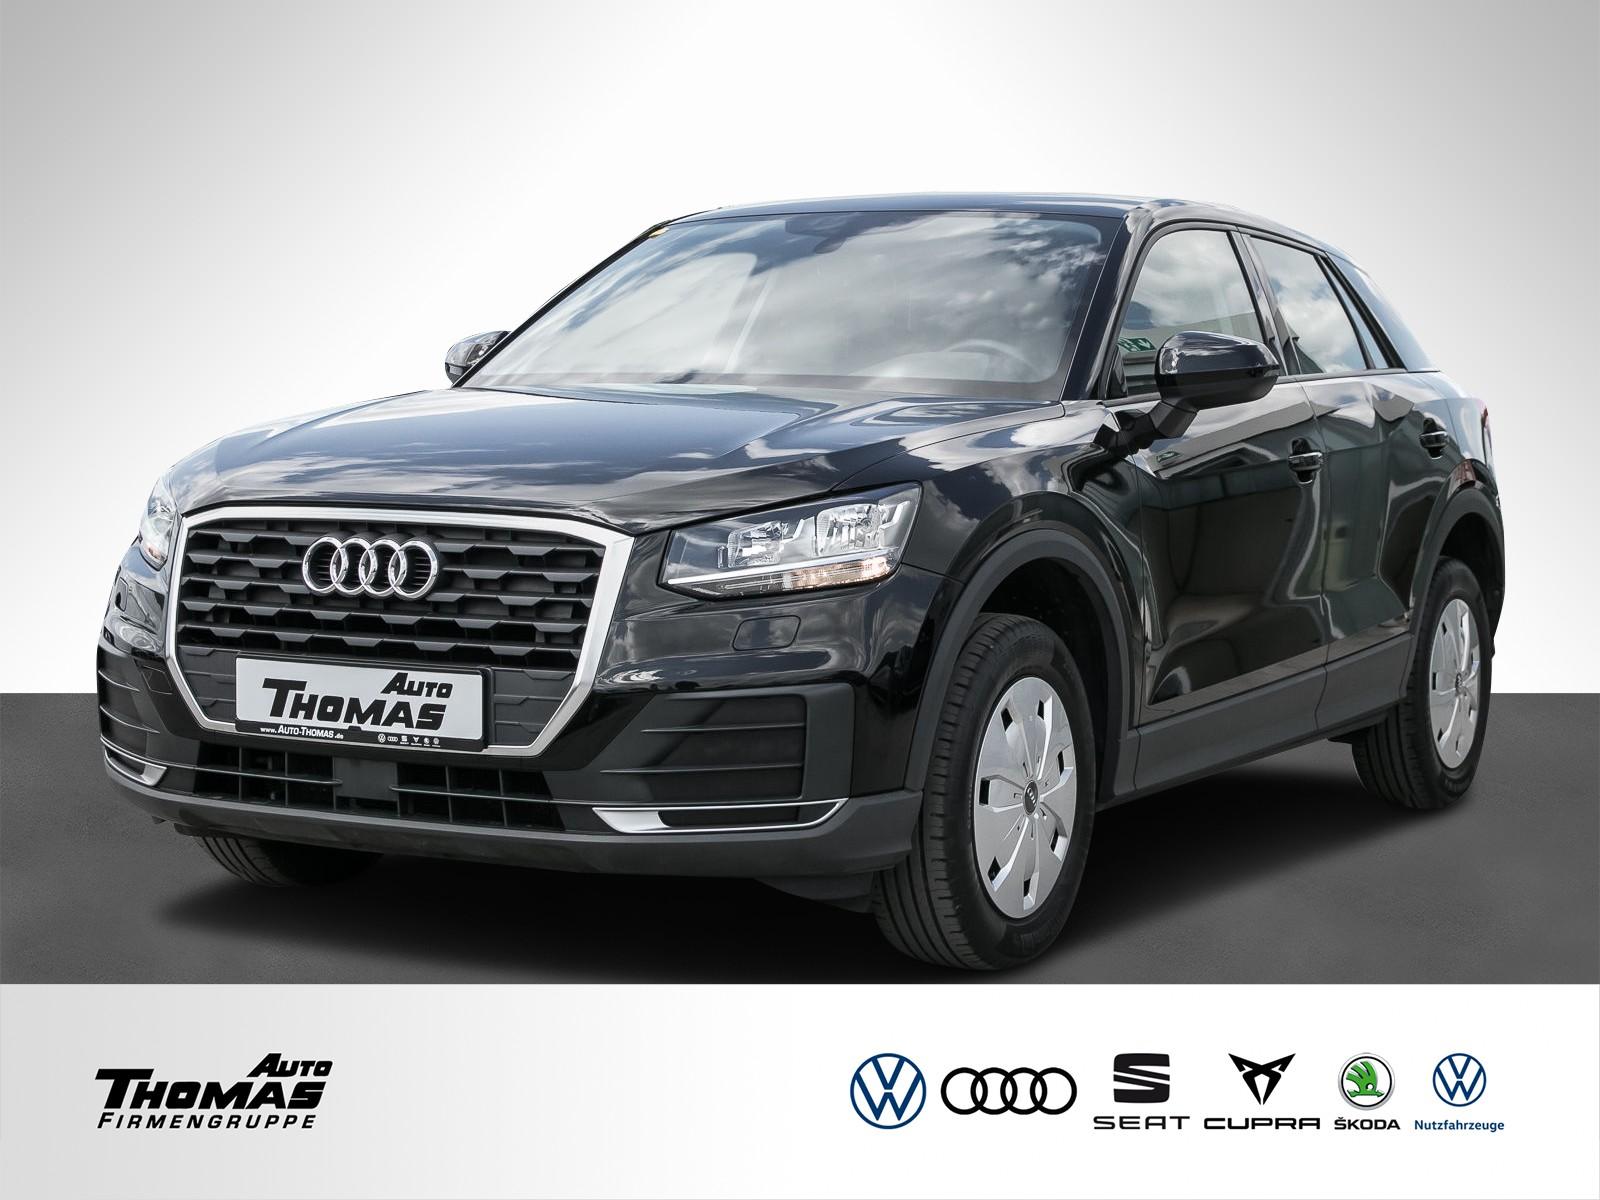 Audi Q2 1.6 TDI NAVI+PDC+GARANTIE, Jahr 2017, Diesel